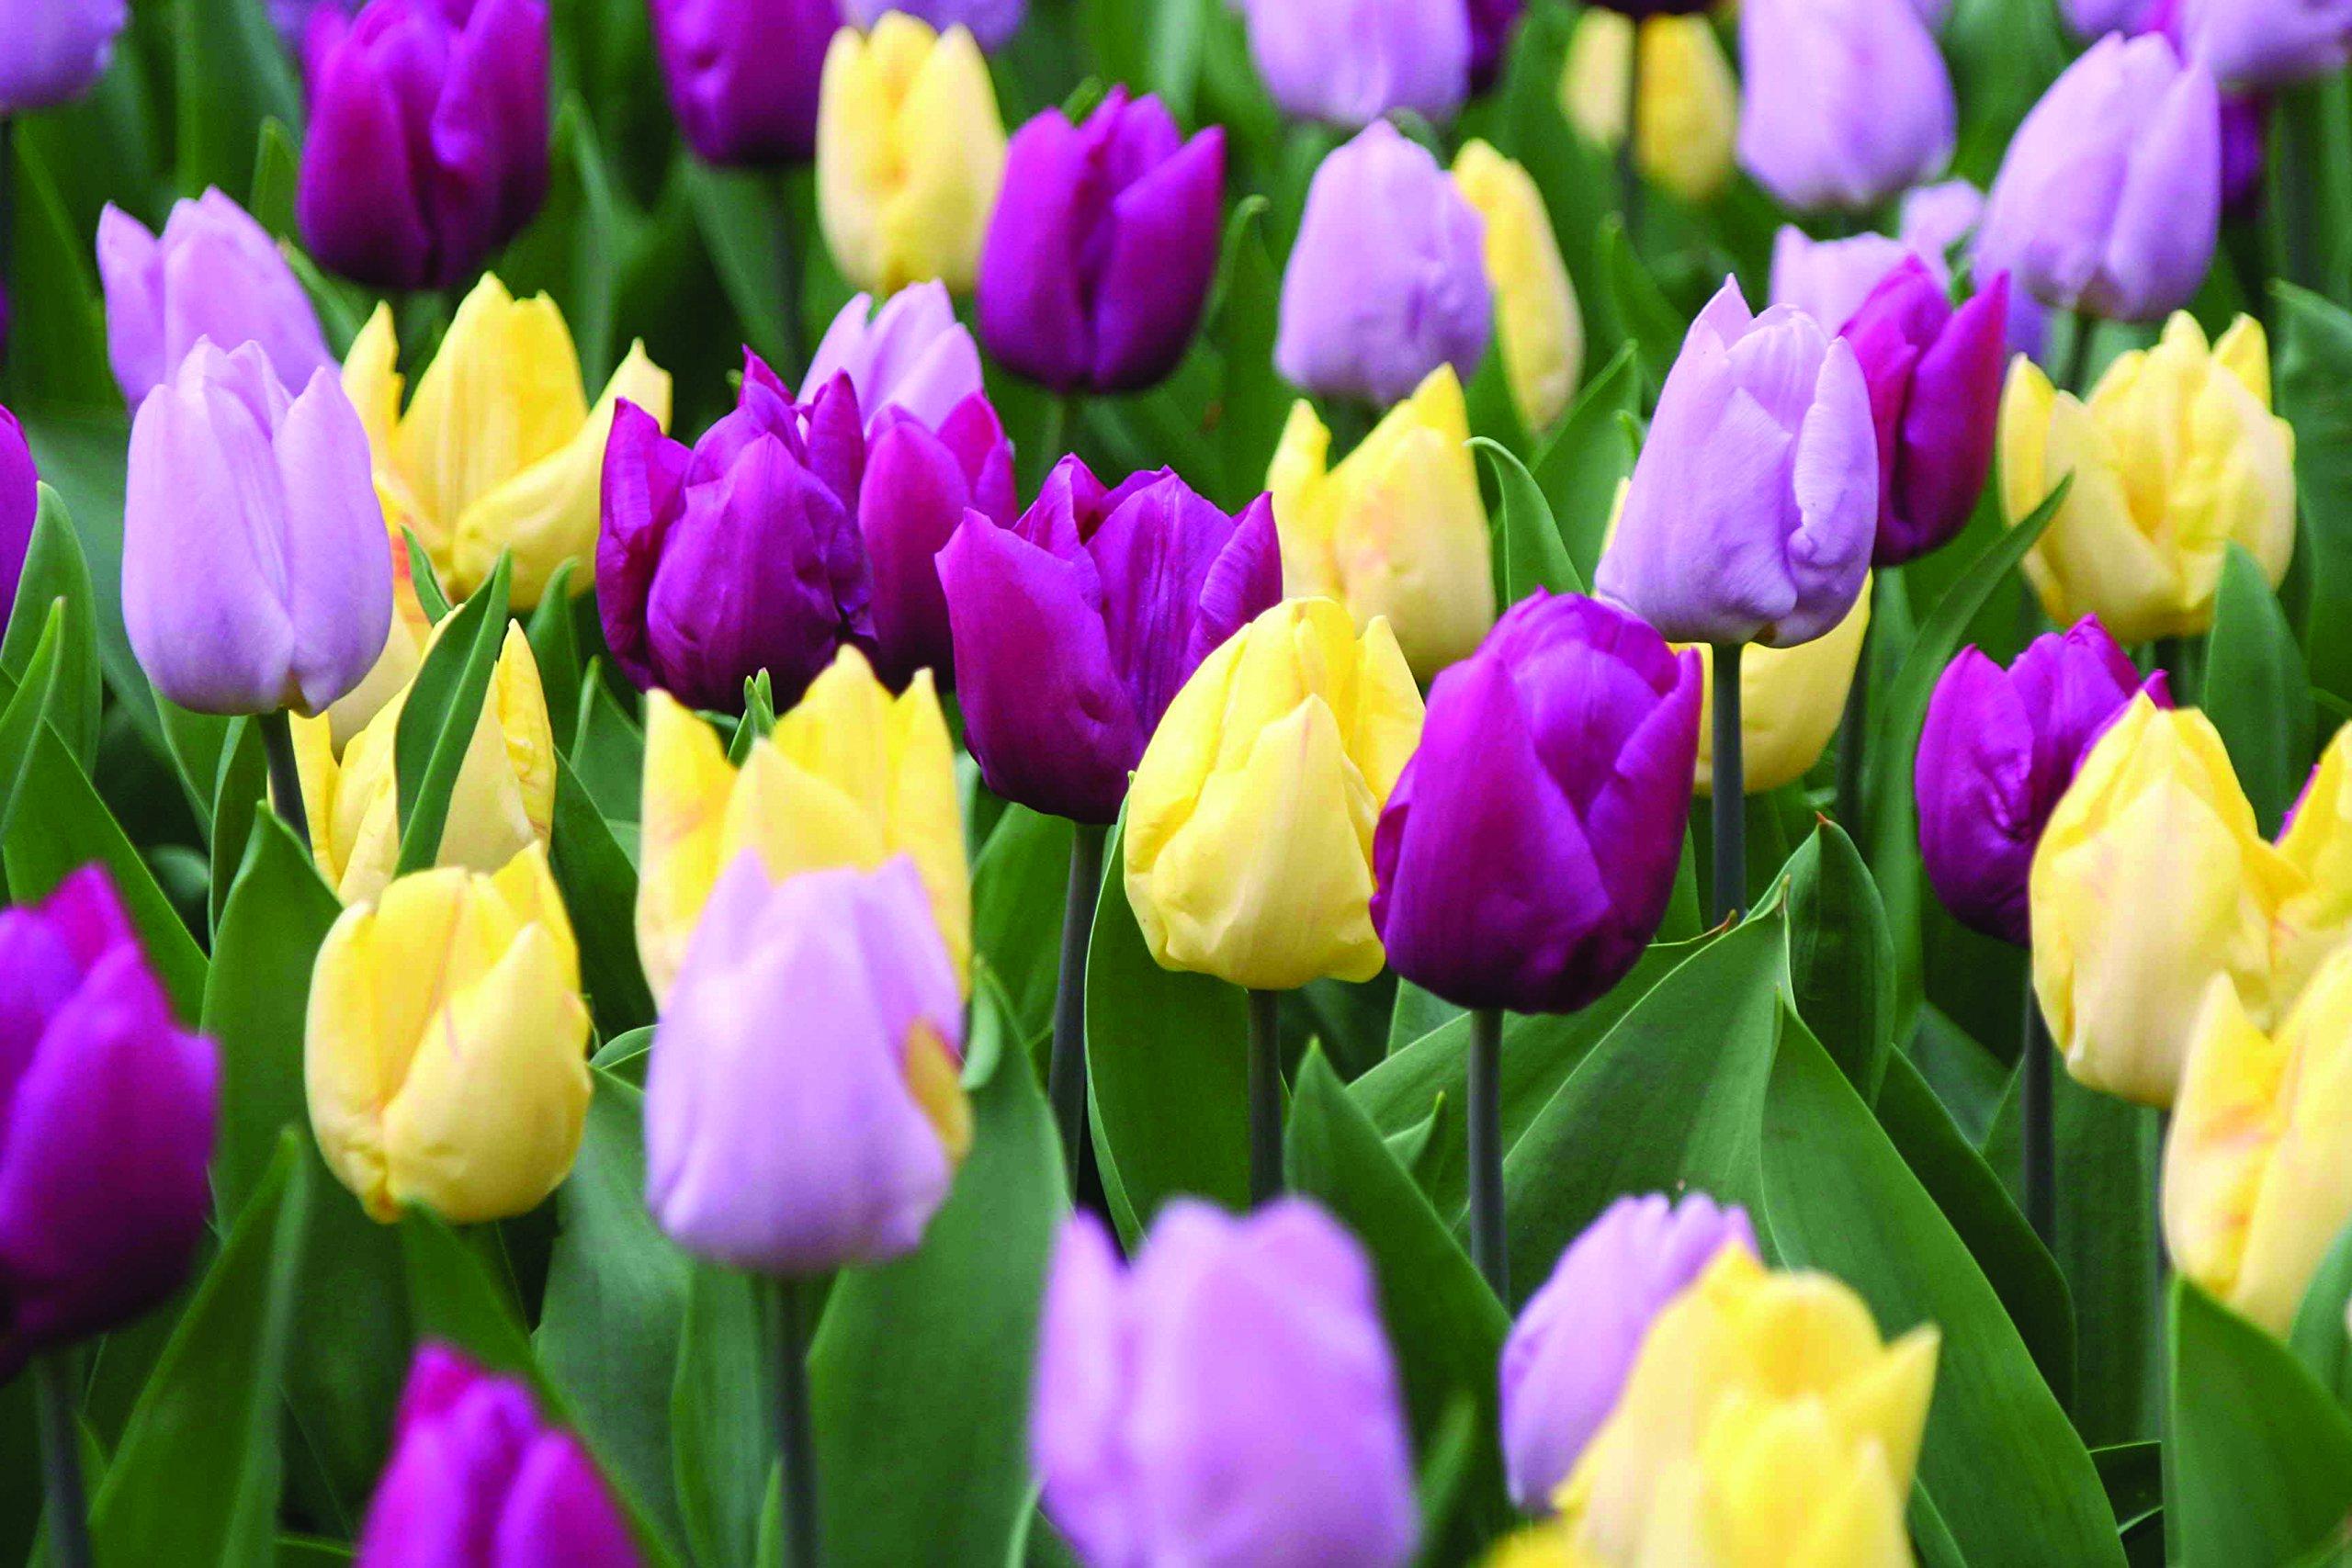 Burpee's Early Prince Tulip Mix - 15 Flower Bulbs | Lavender, Yellow, and Purple | 12 - 14cm Diameter